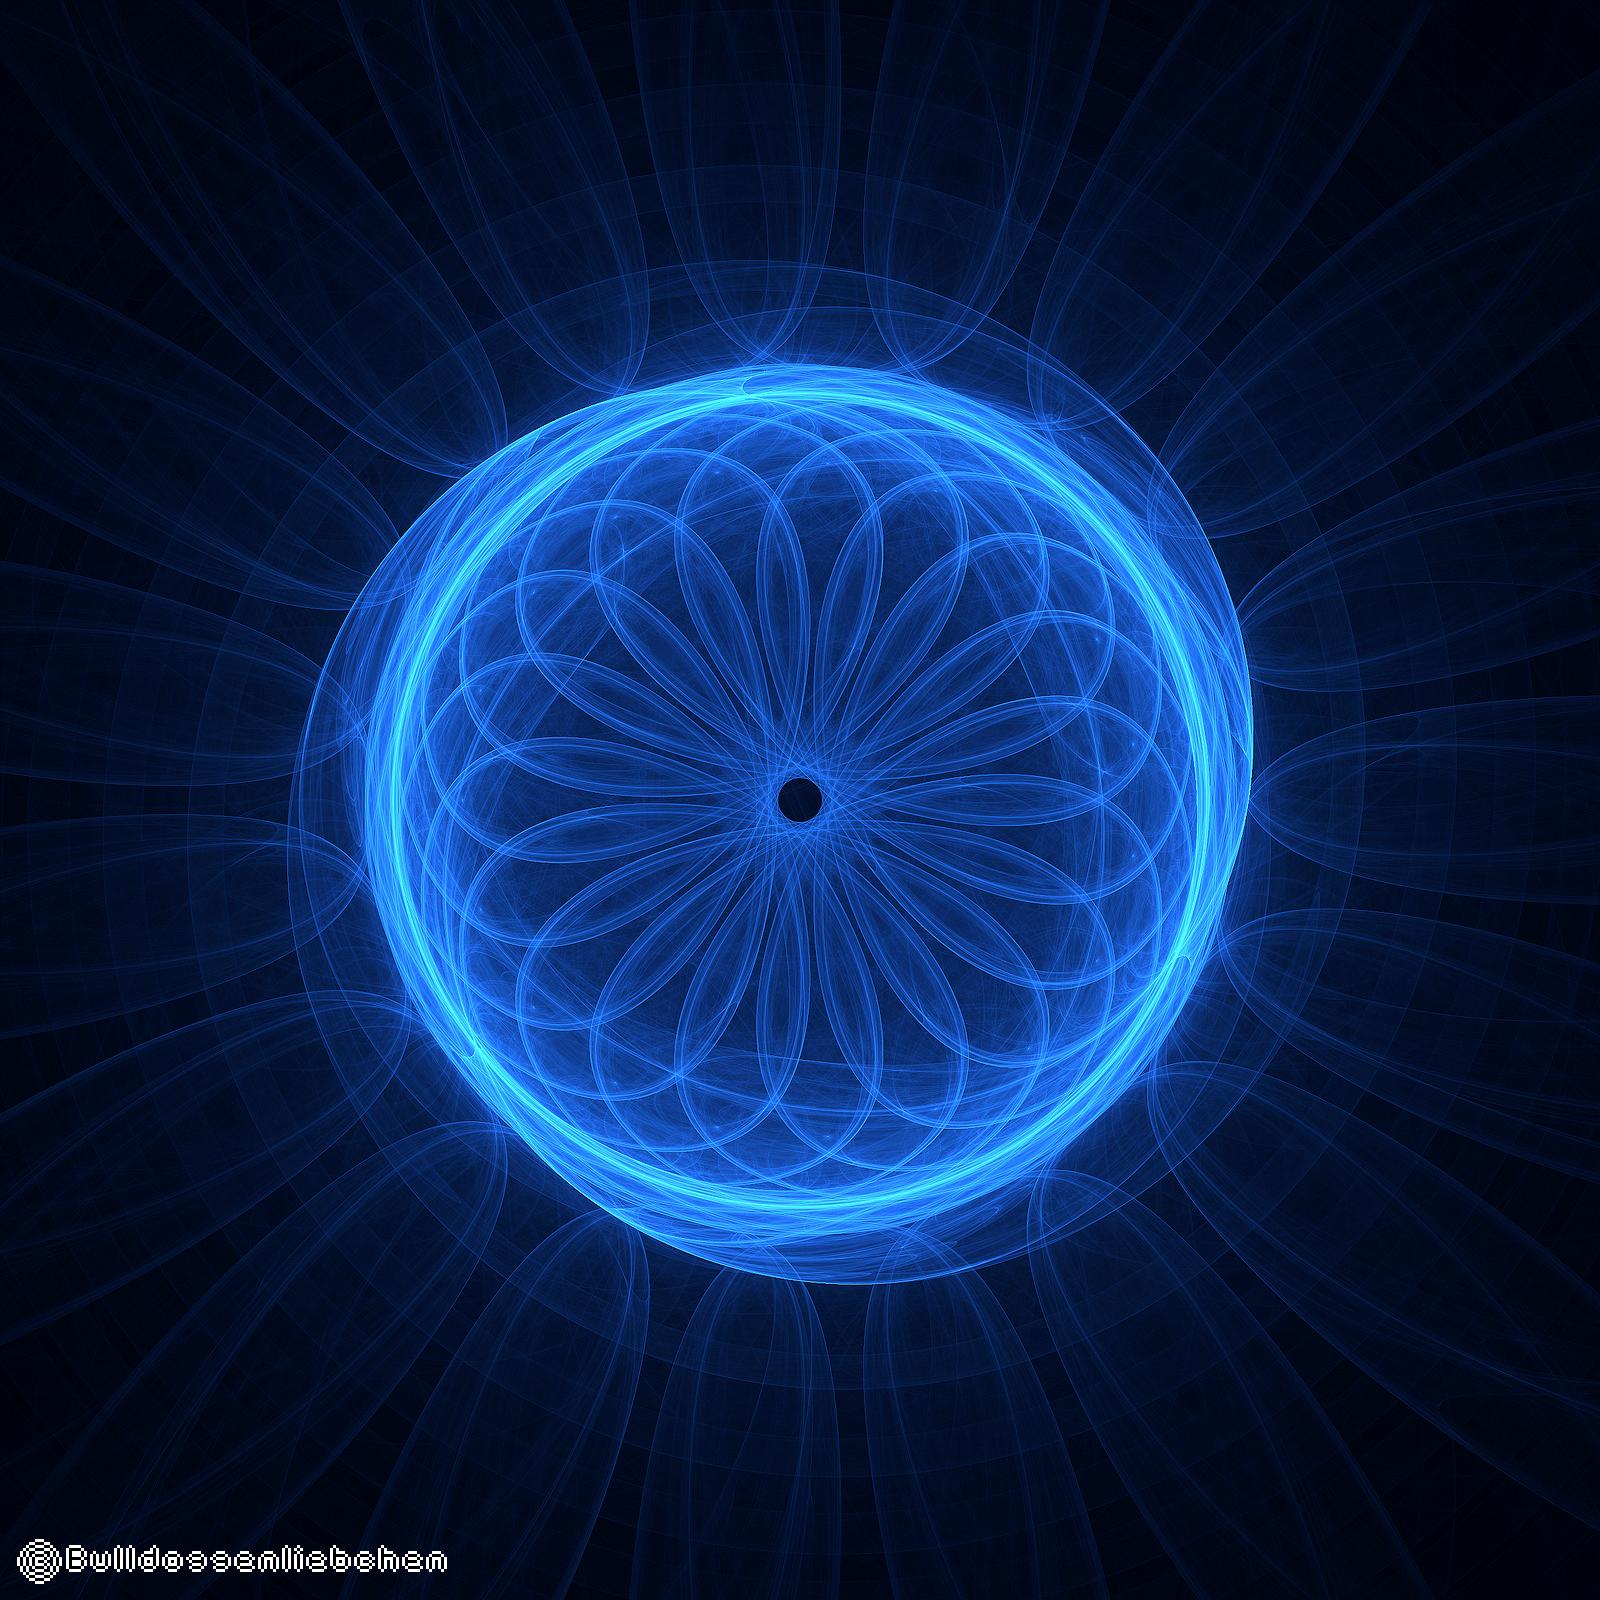 Yarn Spiral by Bulldoggenliebchen